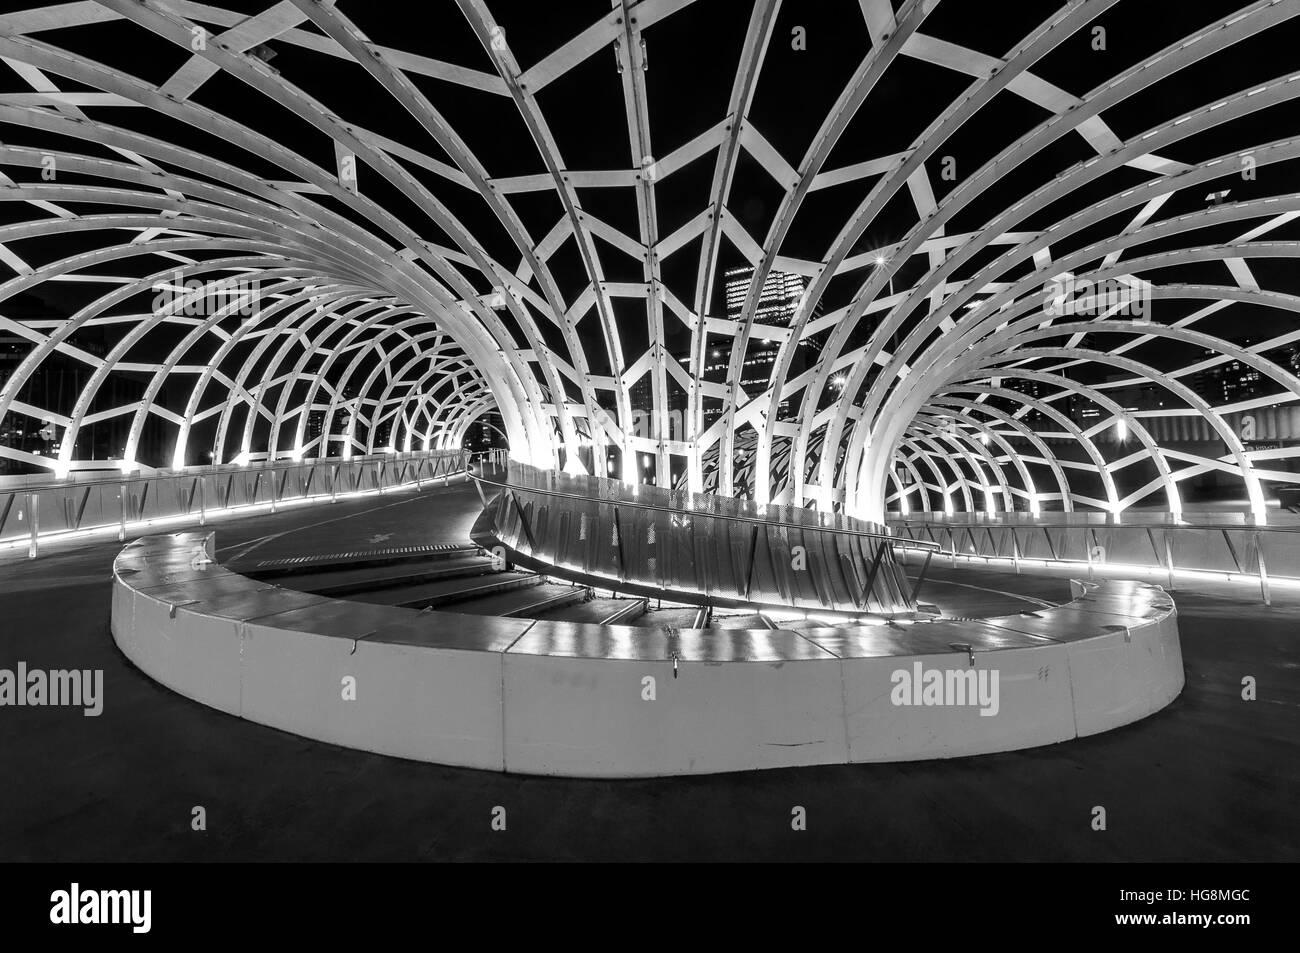 Webb Bridge shot in B&W with high contrast - Stock Image